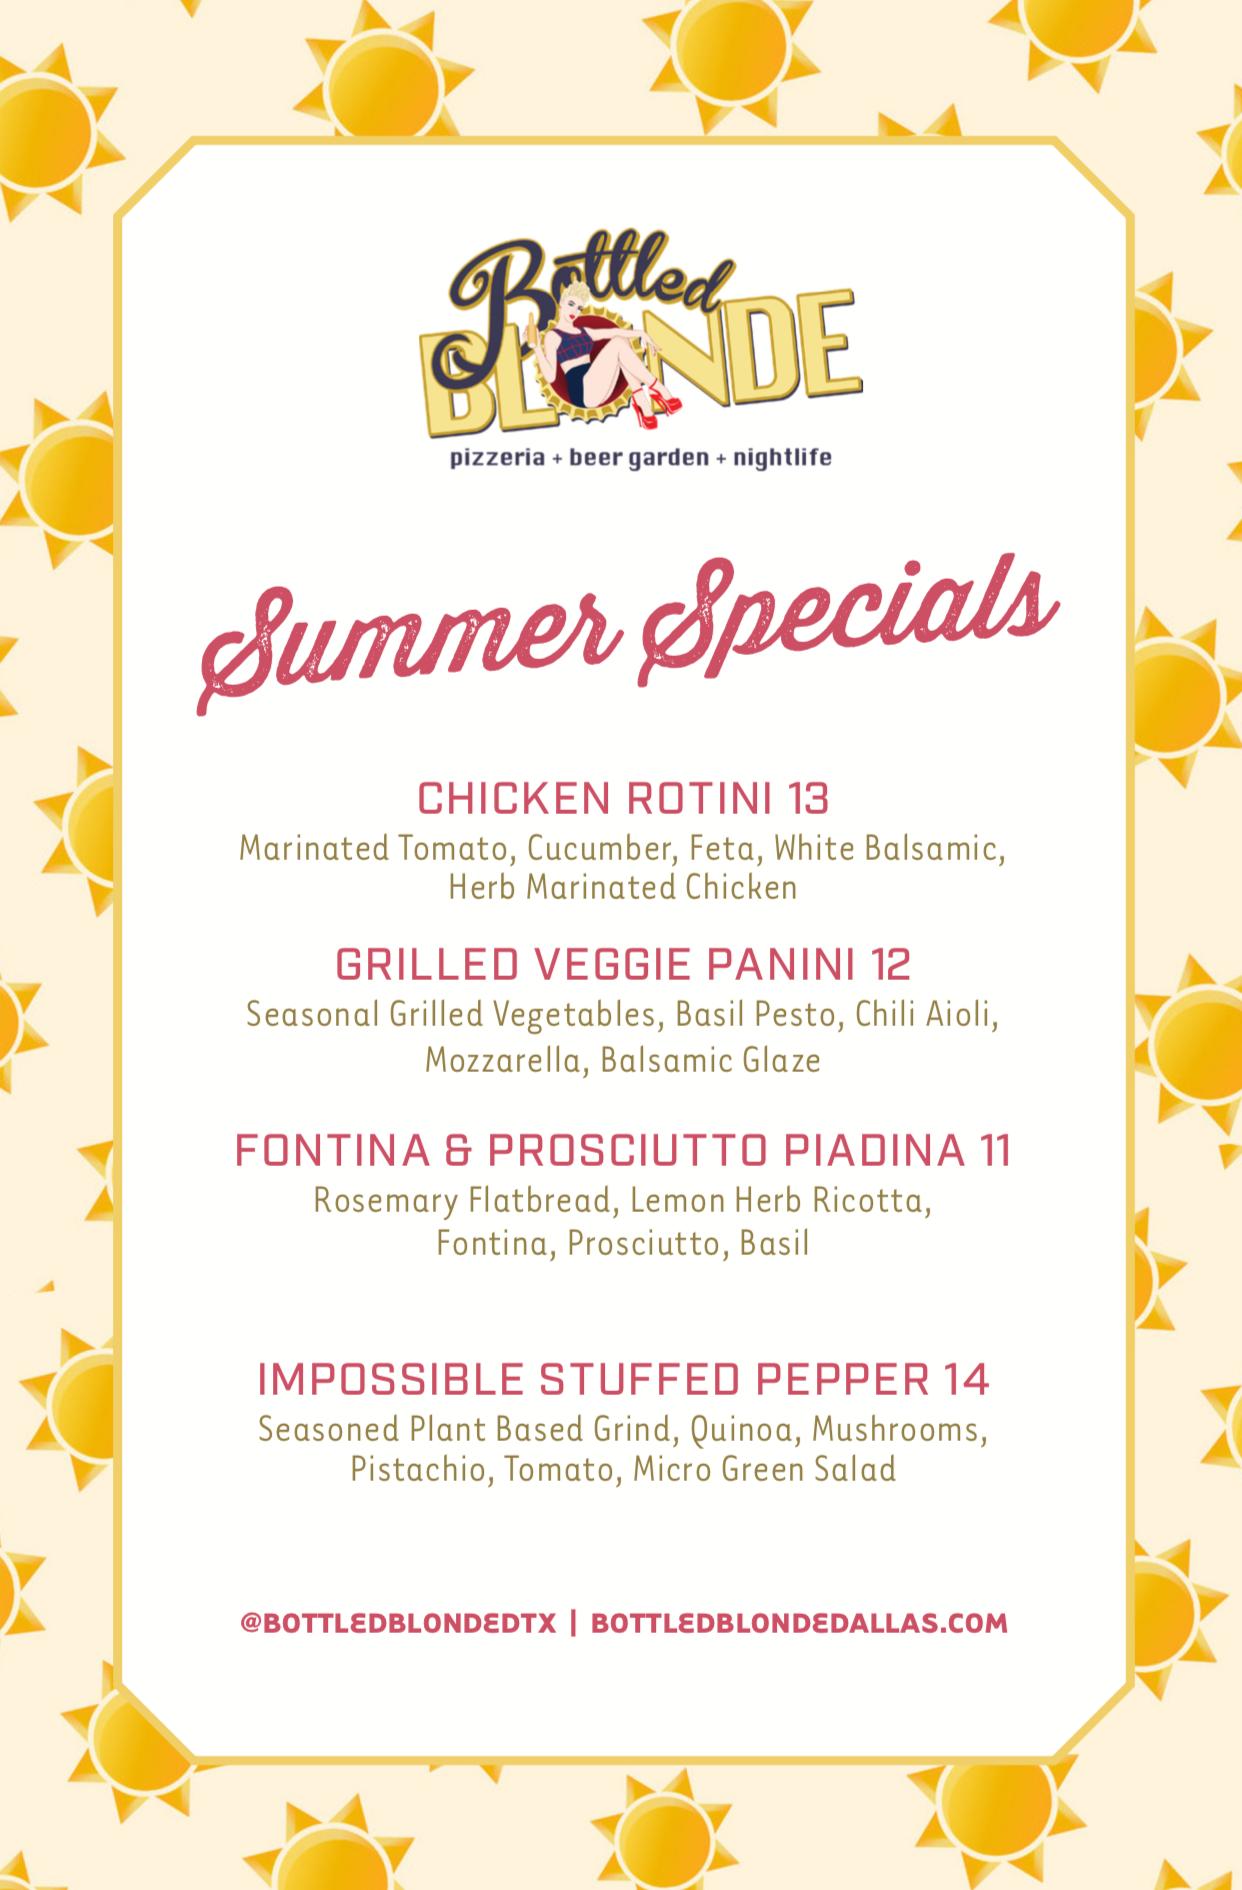 Bottled Blonde Menus & Specials | Best Italian Food